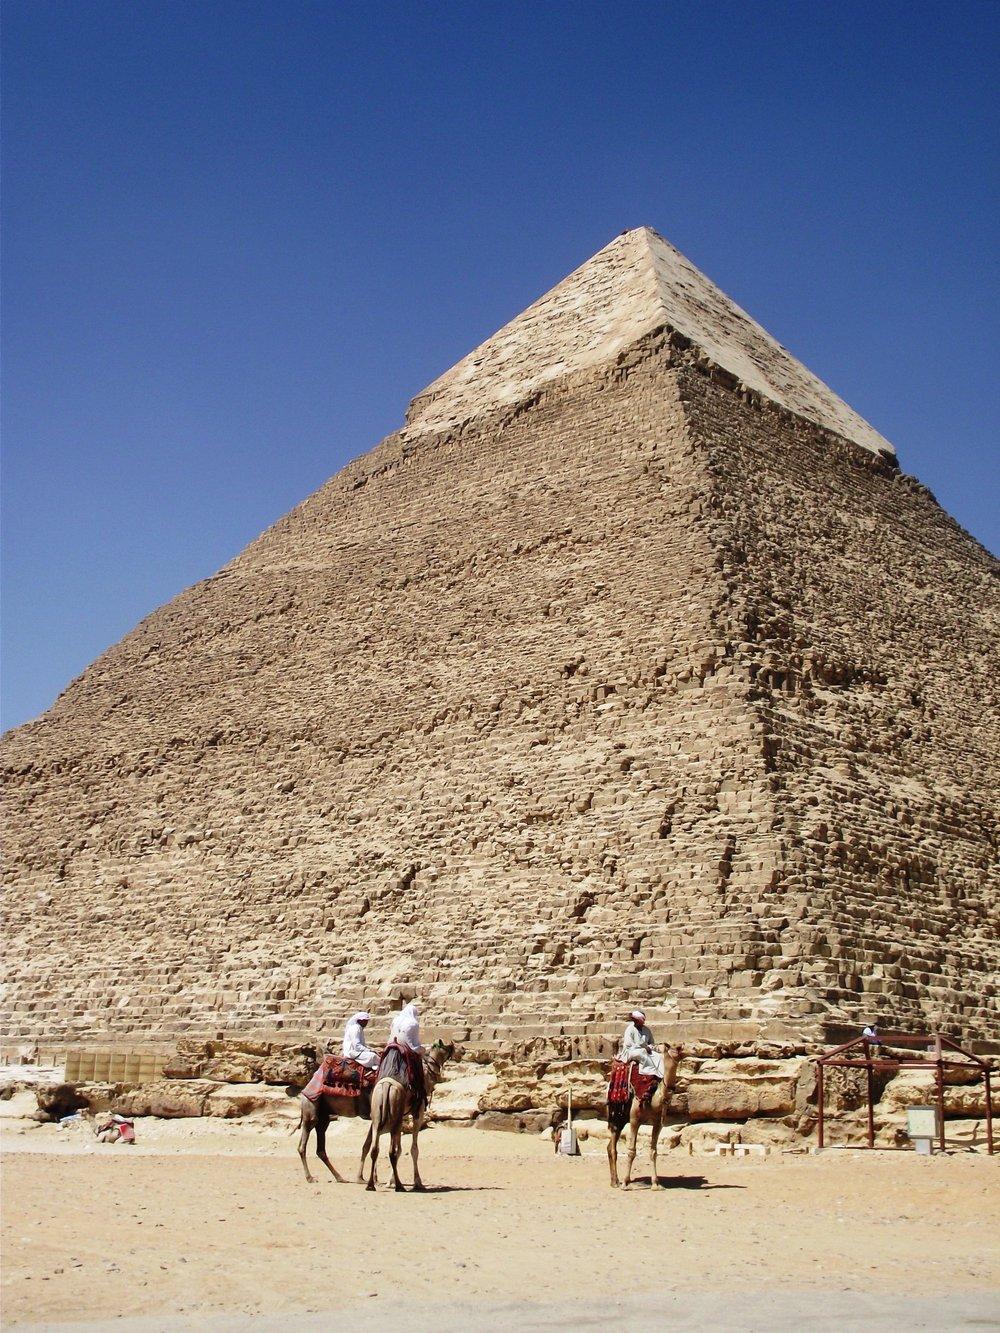 Egypt-Cairo-Pyramids-of-Giza-e1479332024838.jpg